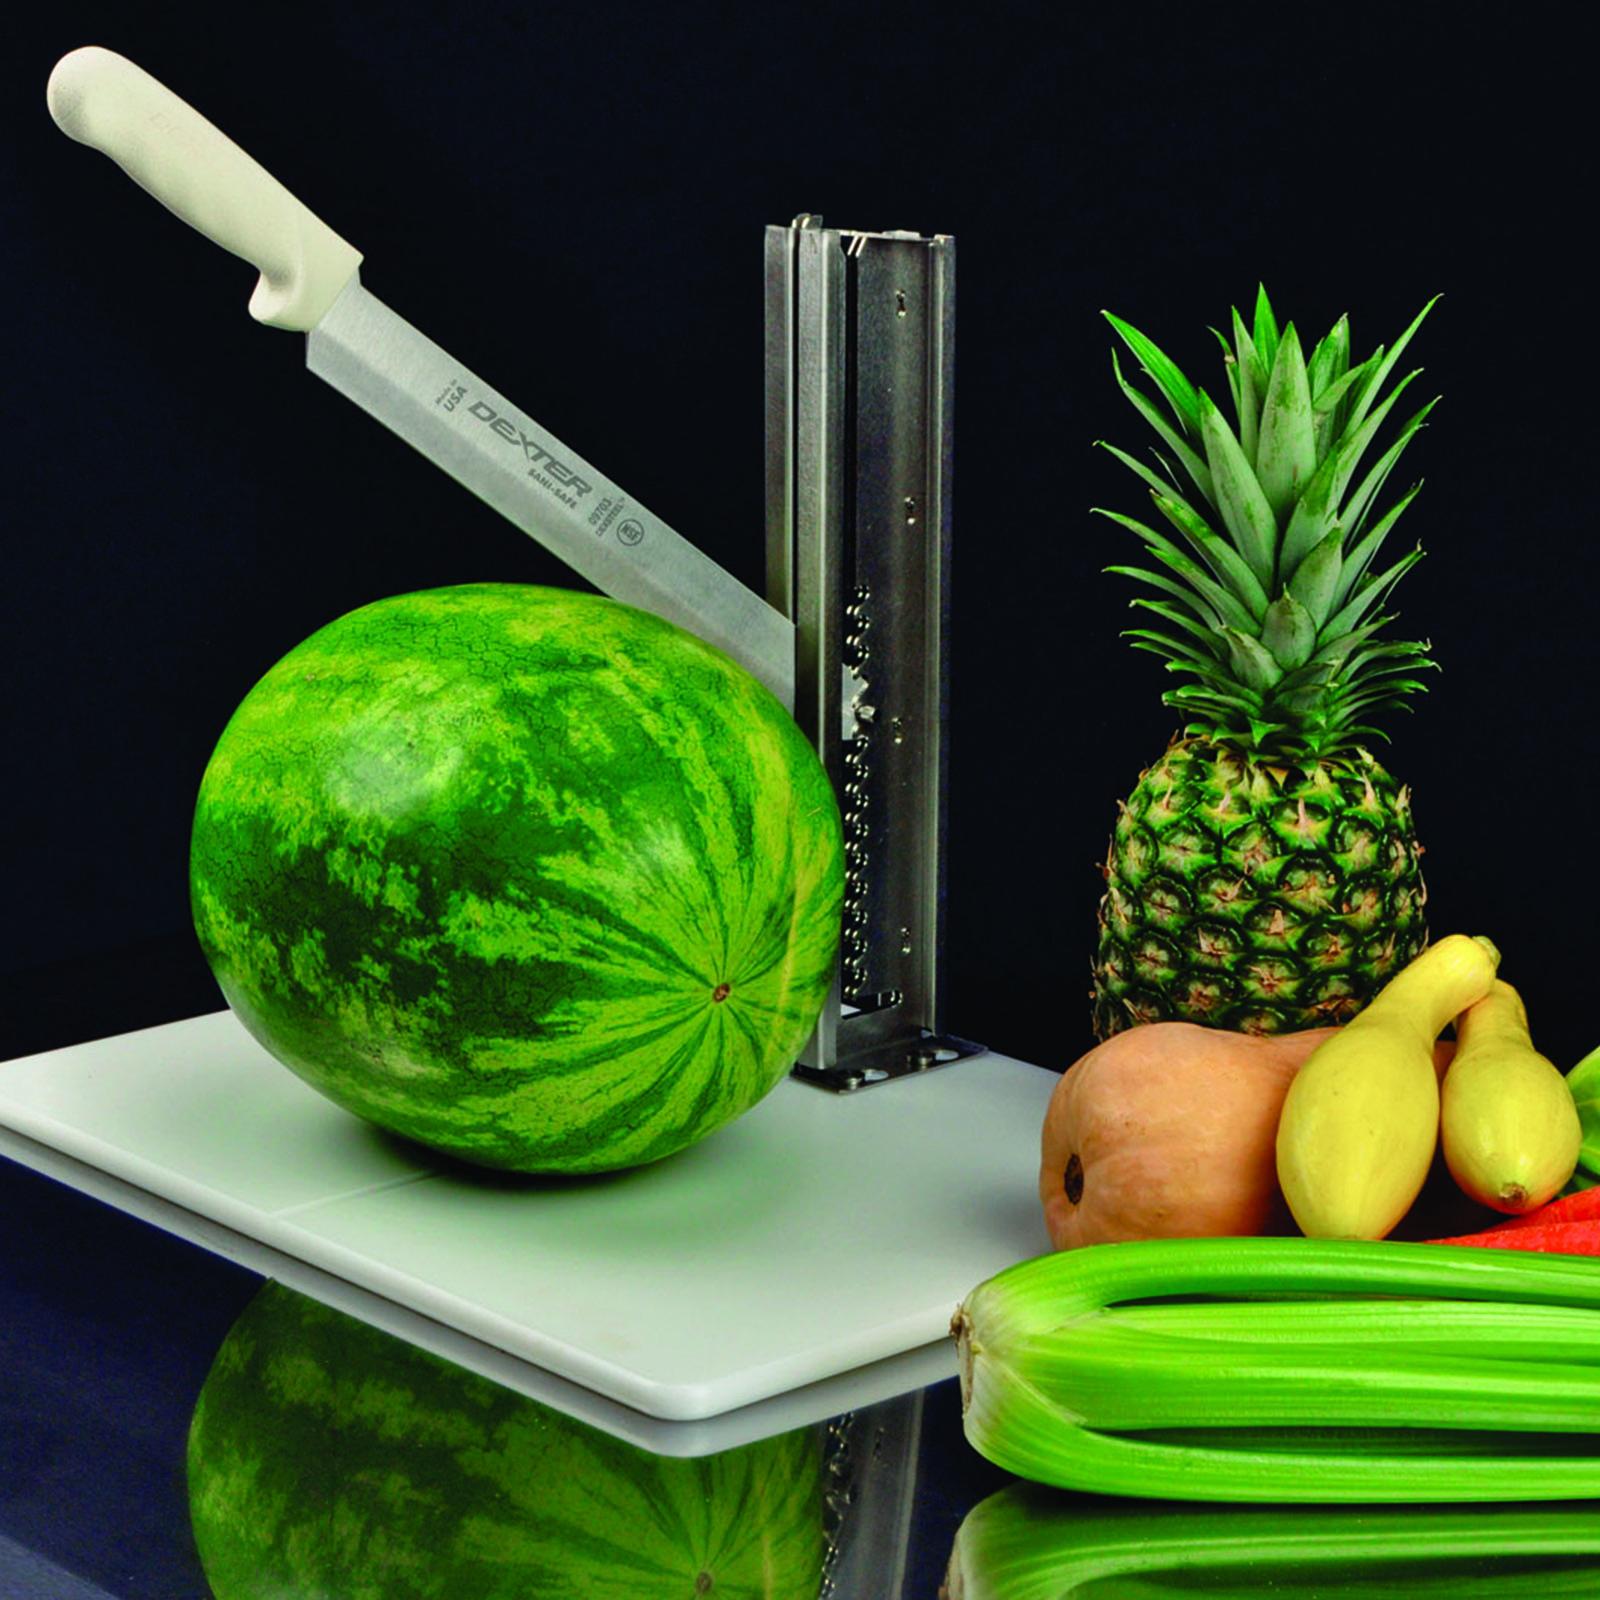 Dexter Russell 09703 food slicer, handheld